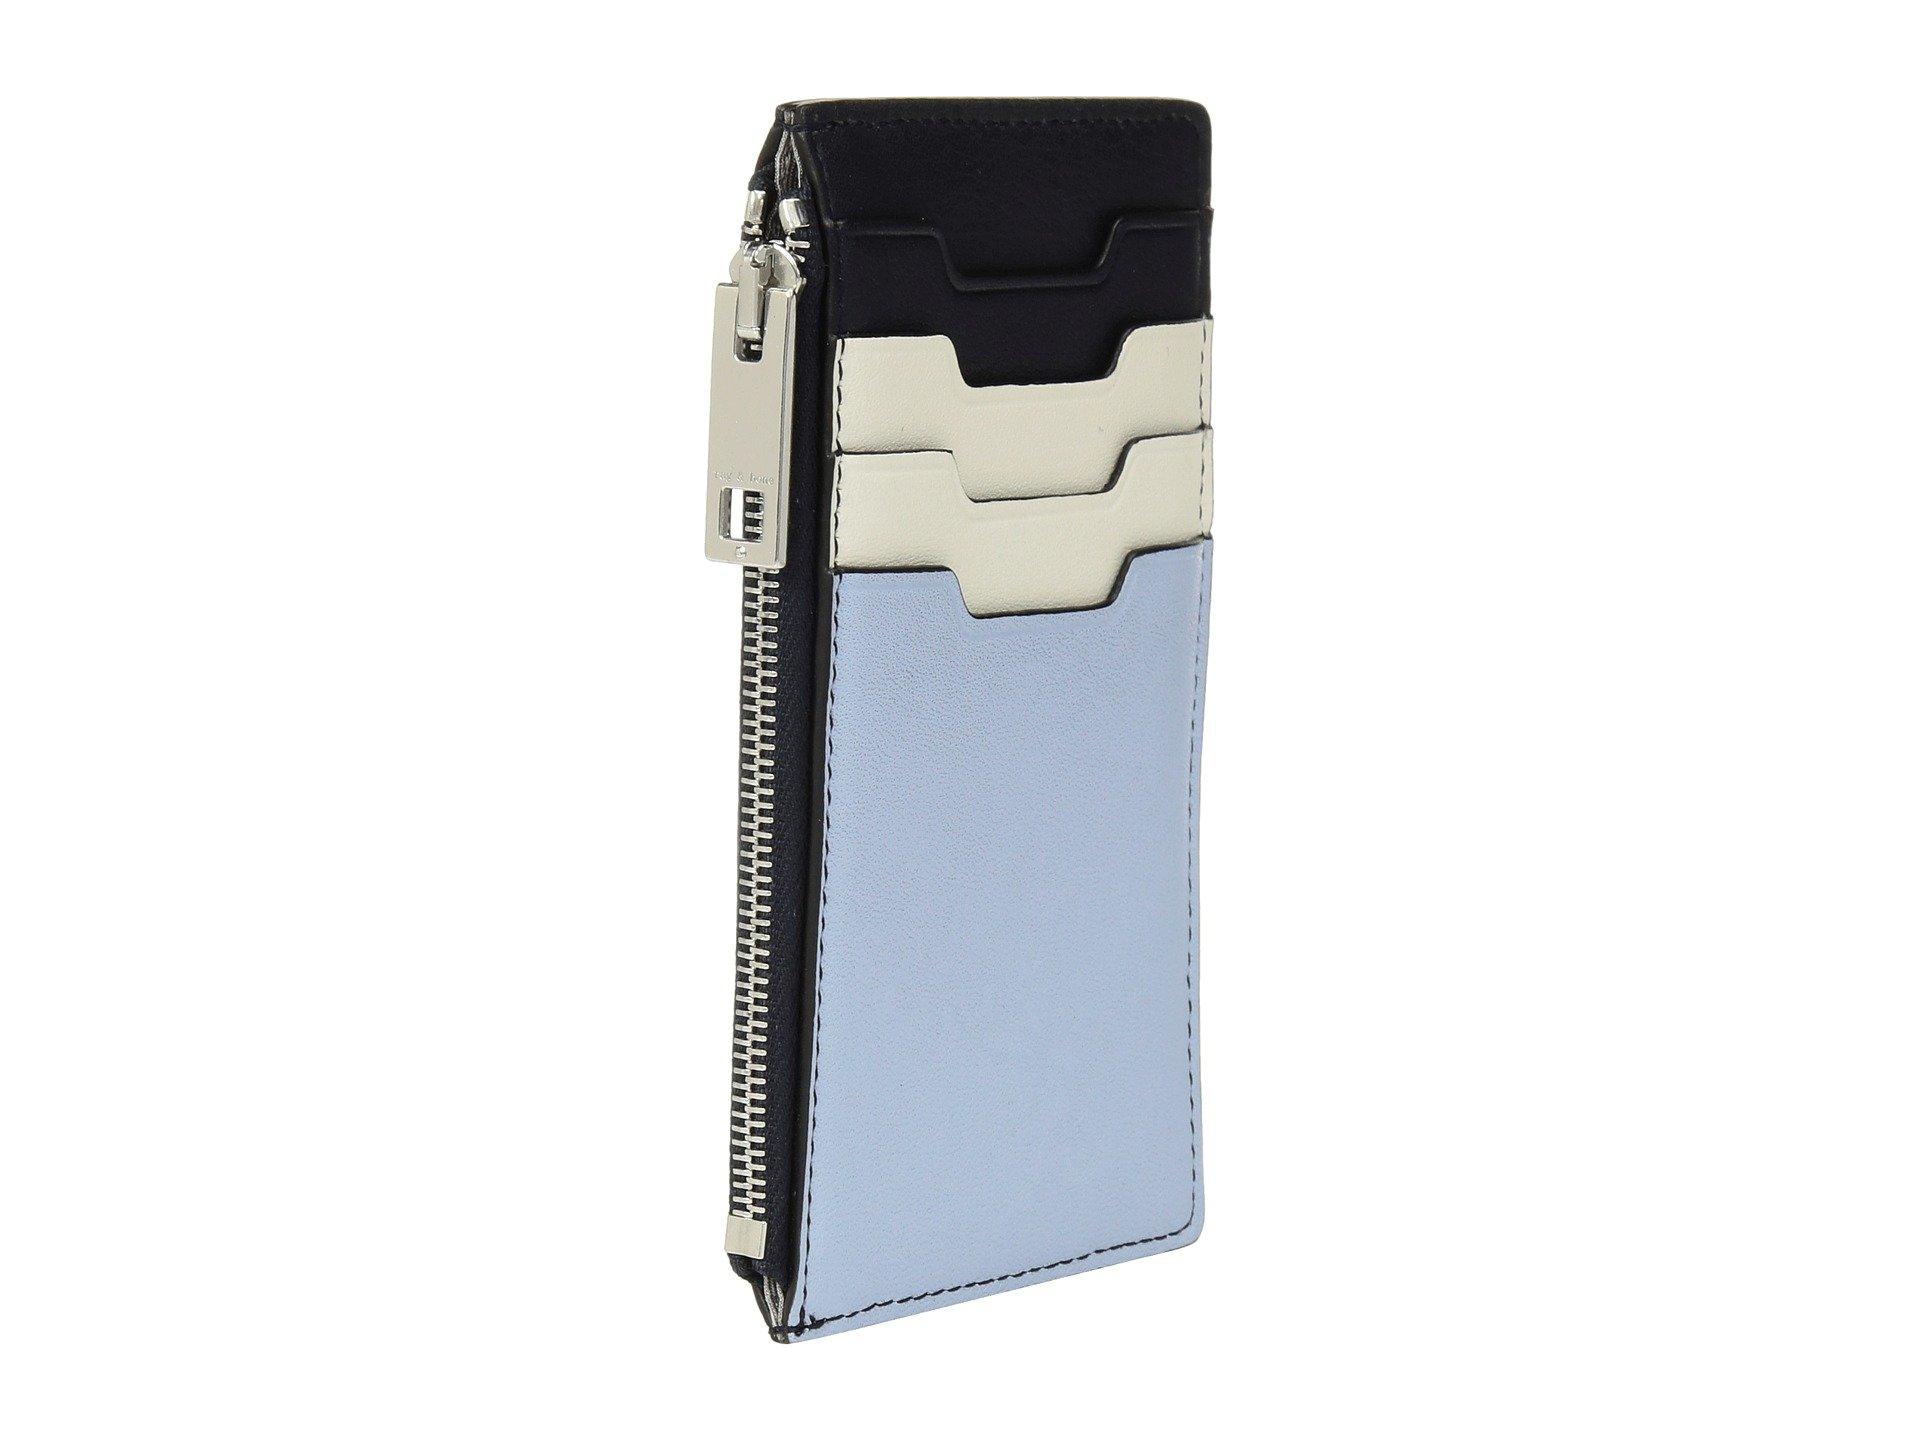 Case Bone Chambray Card amp; Rag Zip Multi BZwqHxI4